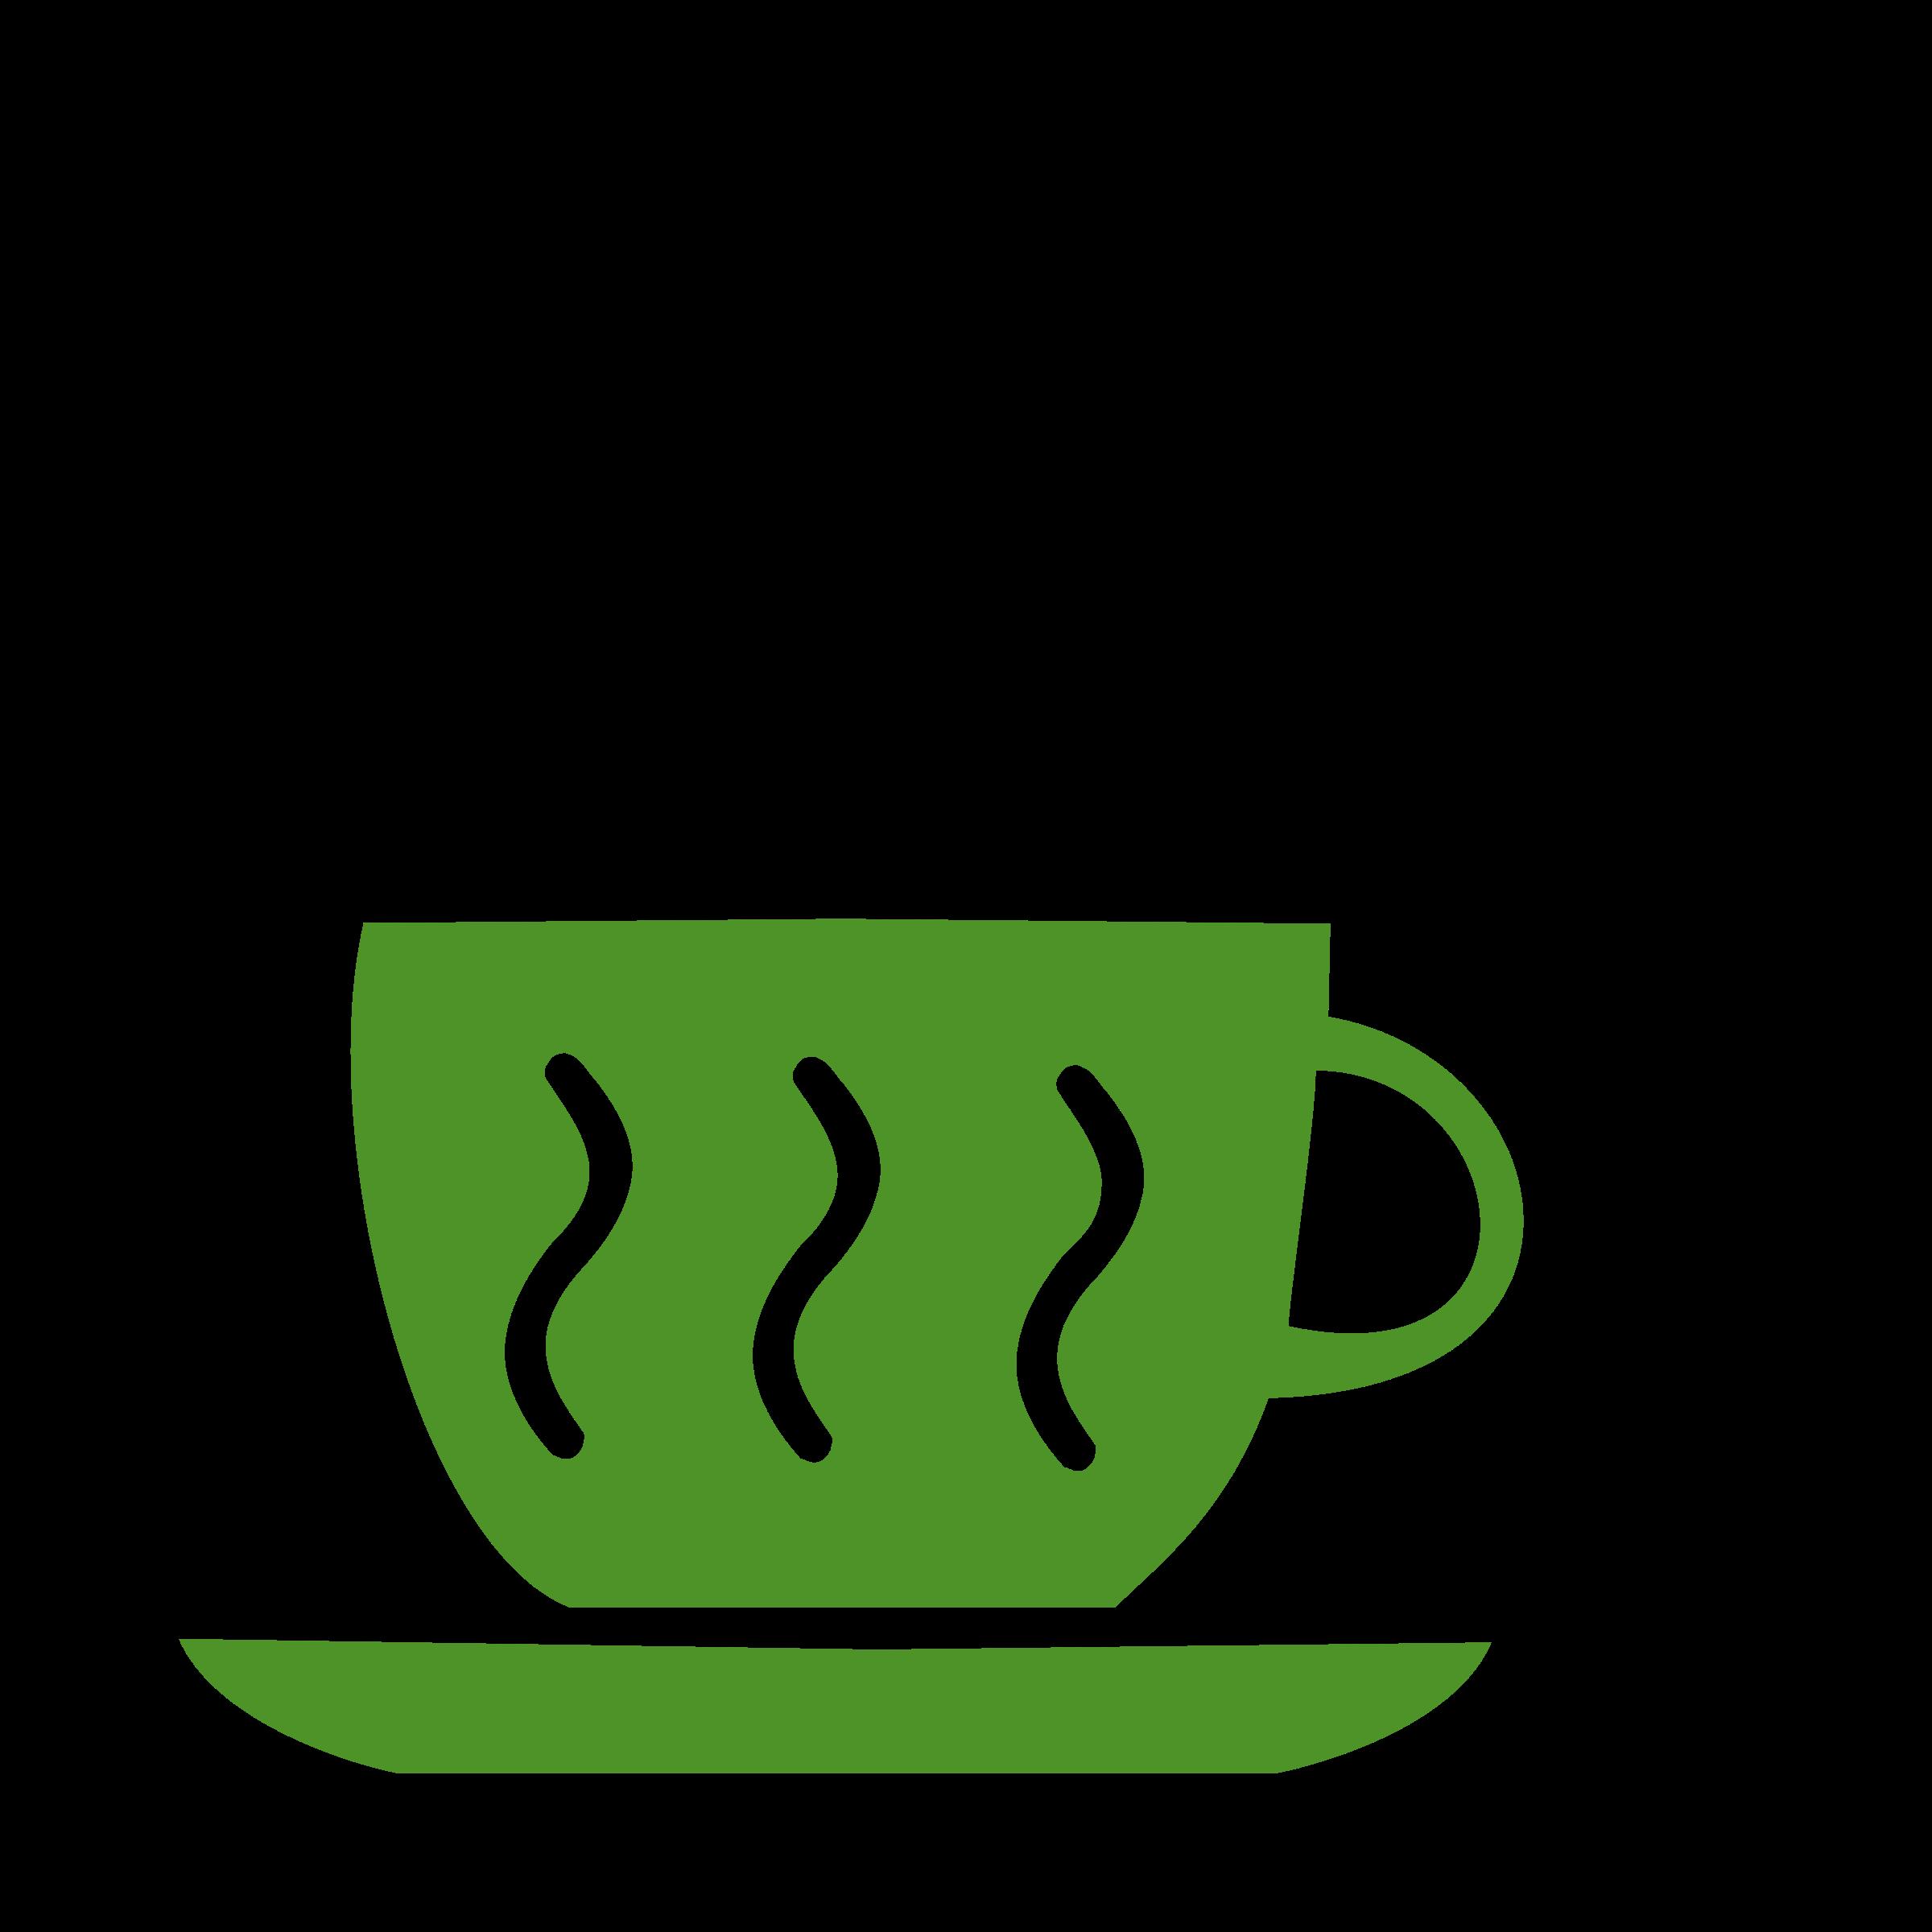 Tea clipart social. Morphing big image png